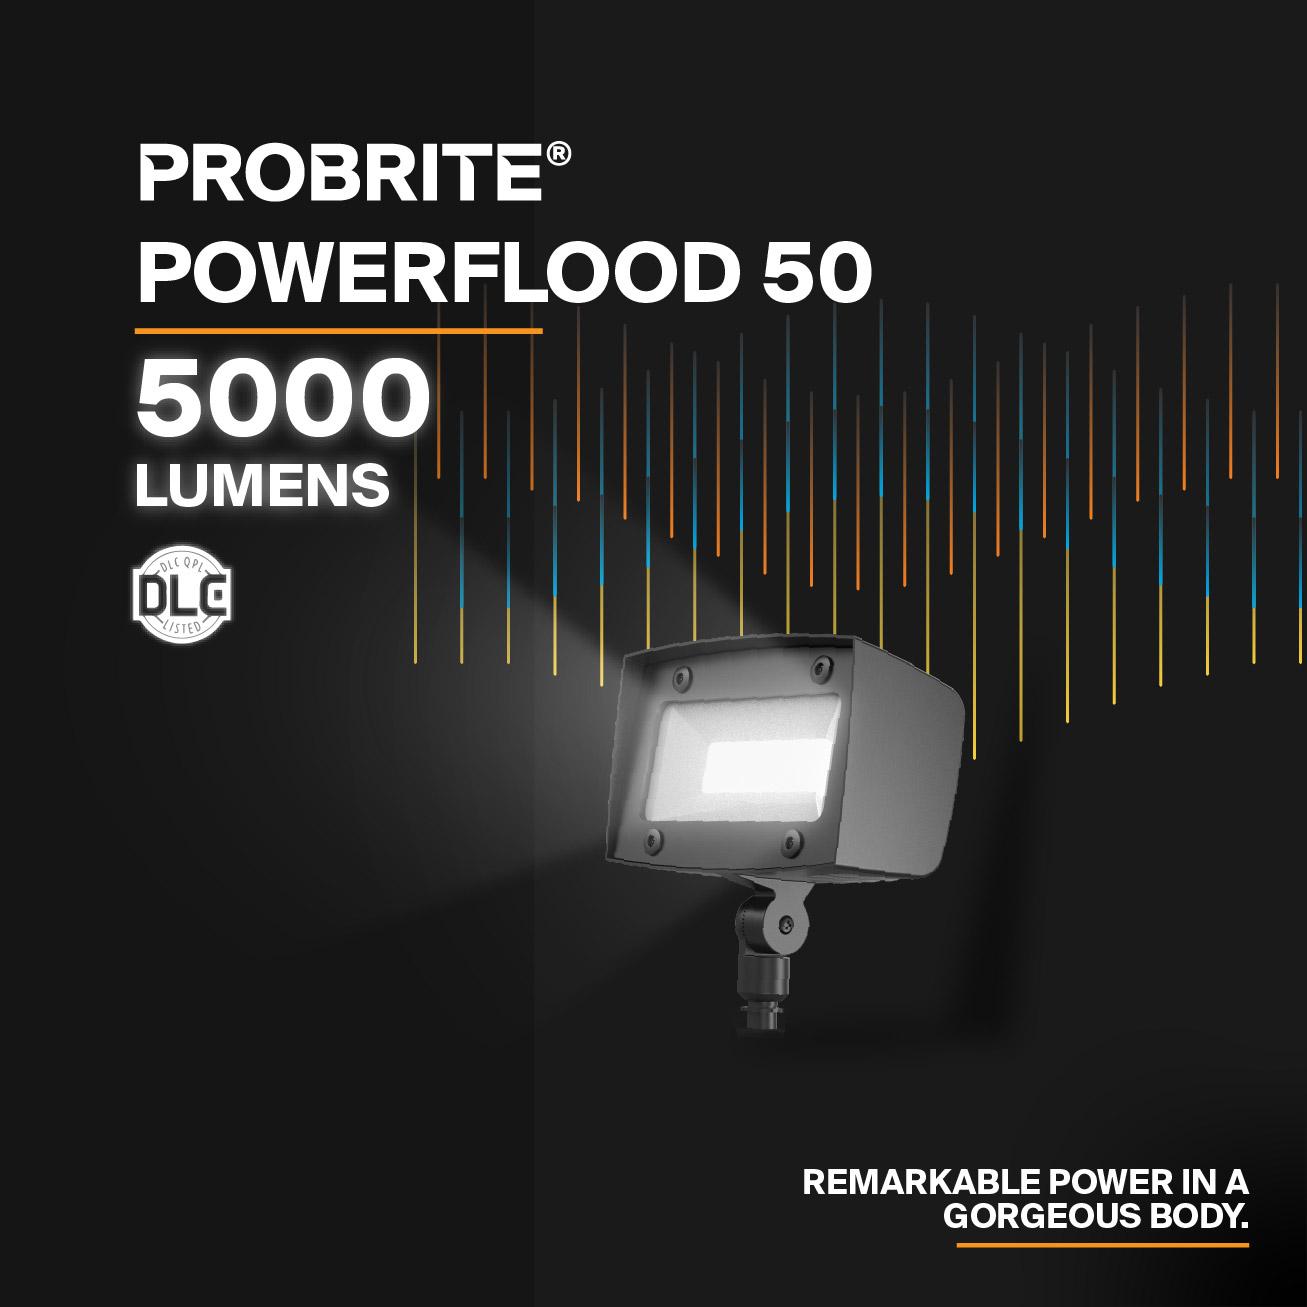 Probrite Powerflood50 LED Flood Light Remarkable Power